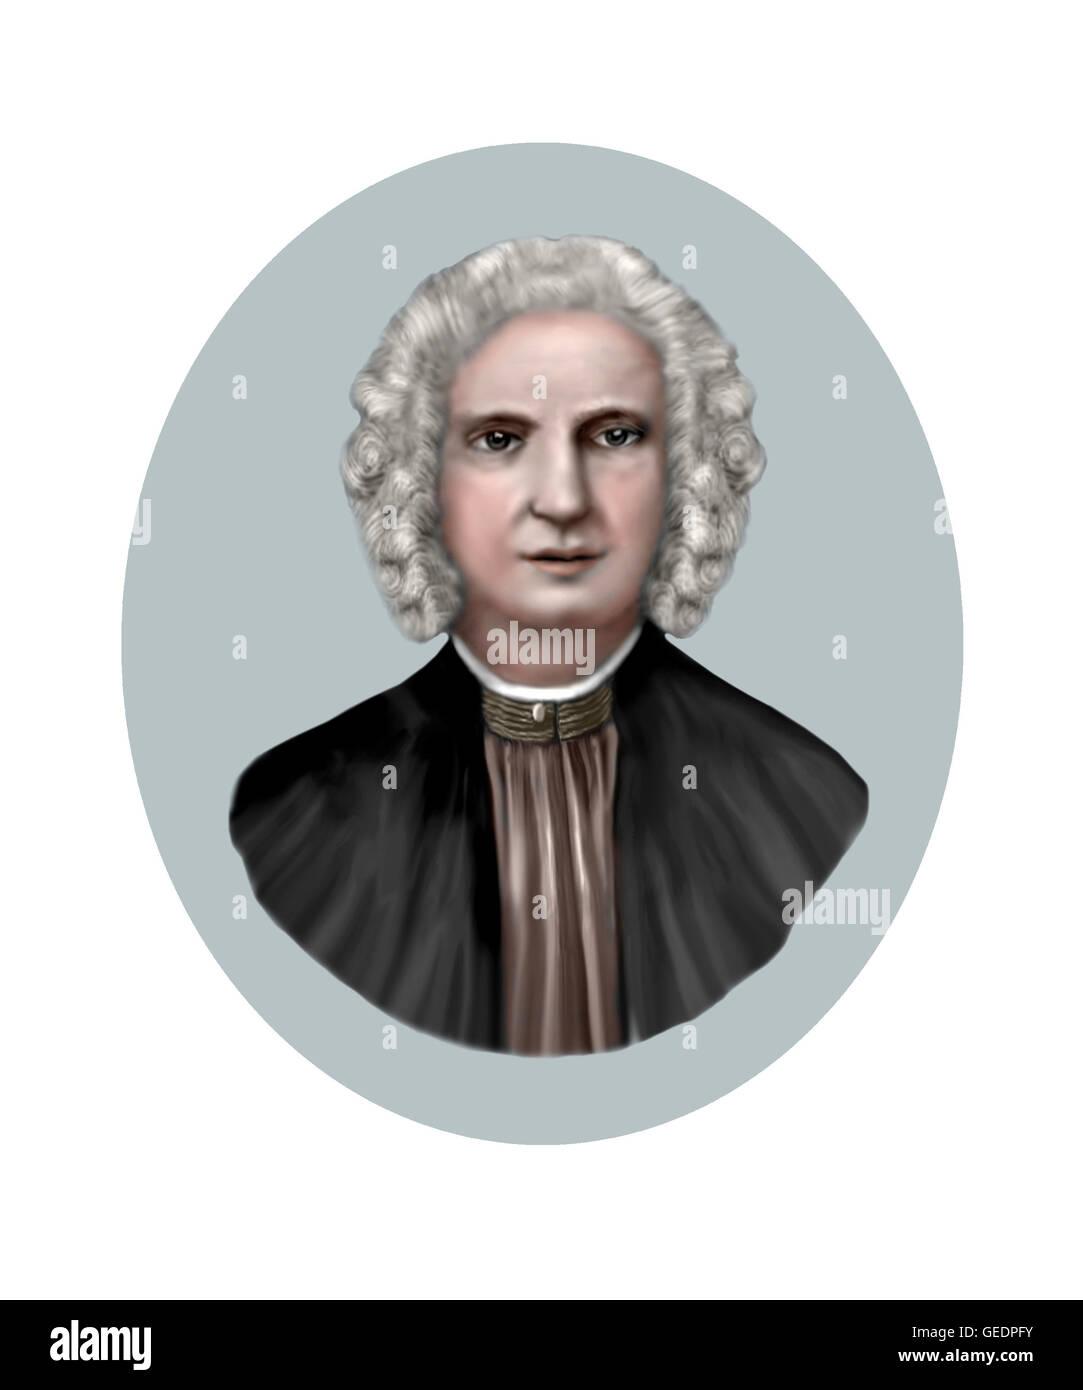 Antonio Vivaldi, 1678-1741, Composer - Stock Image